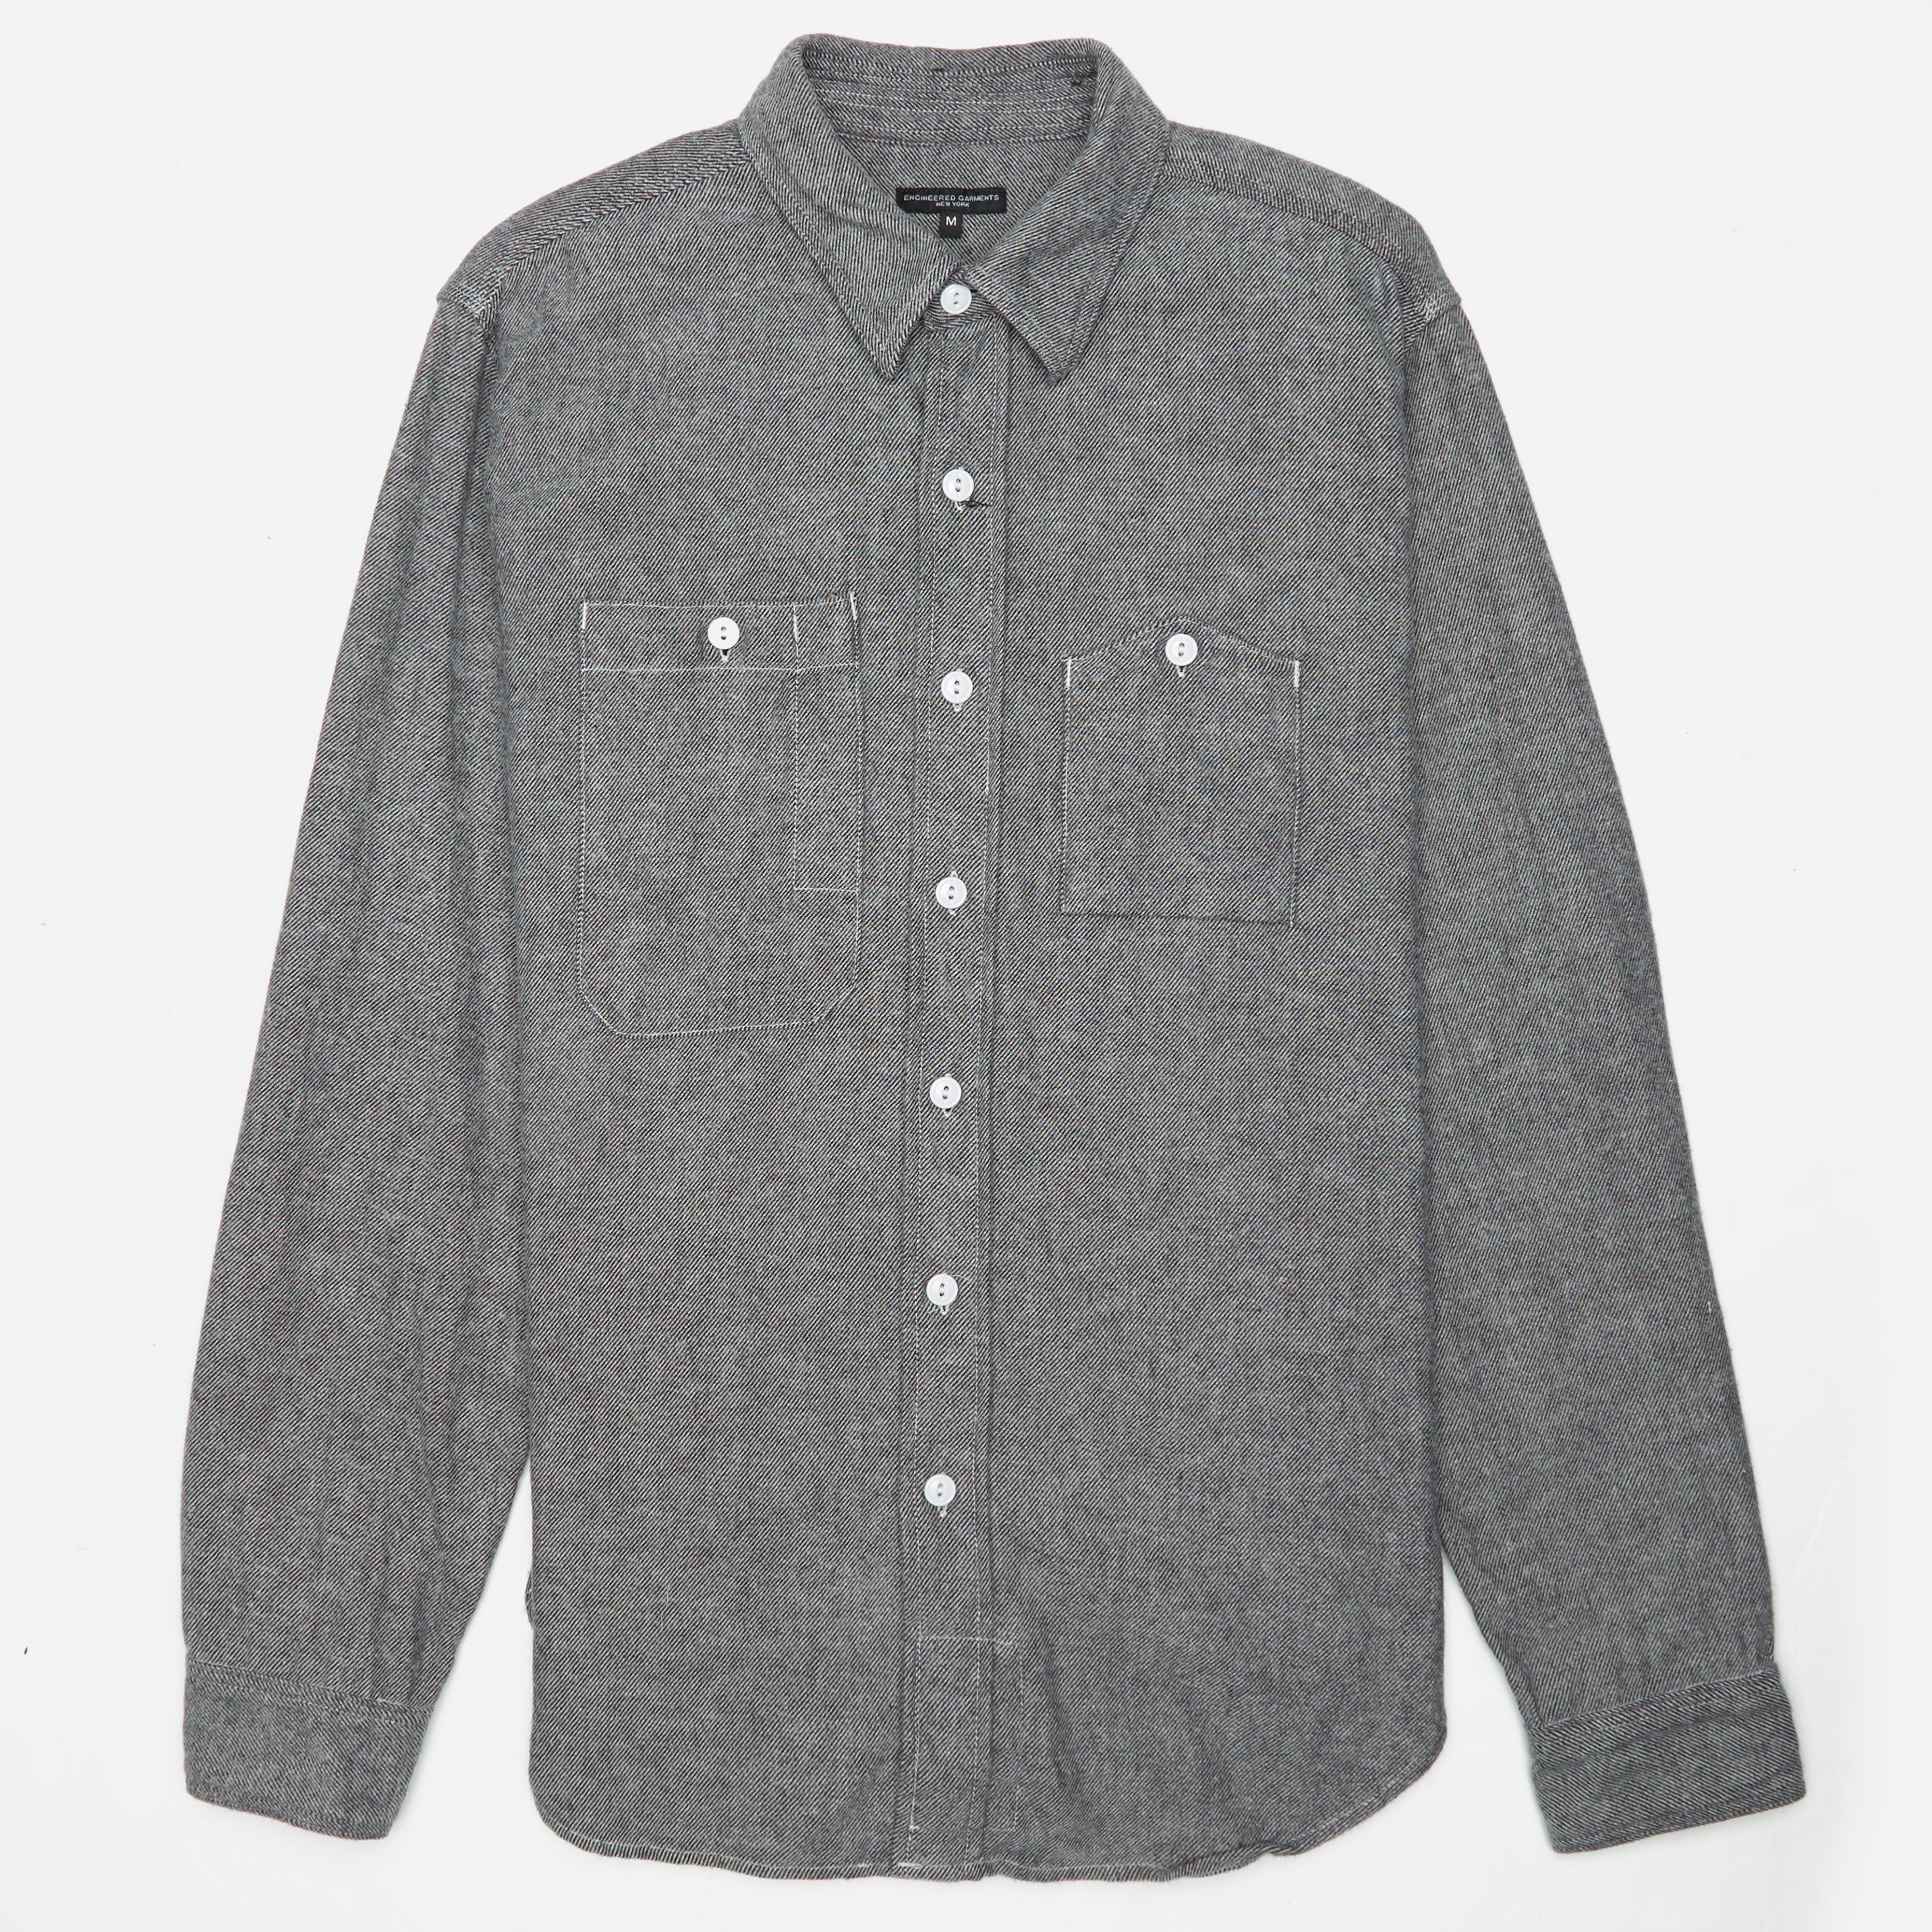 Engineered Garments Work Shirt - Solid Flannel